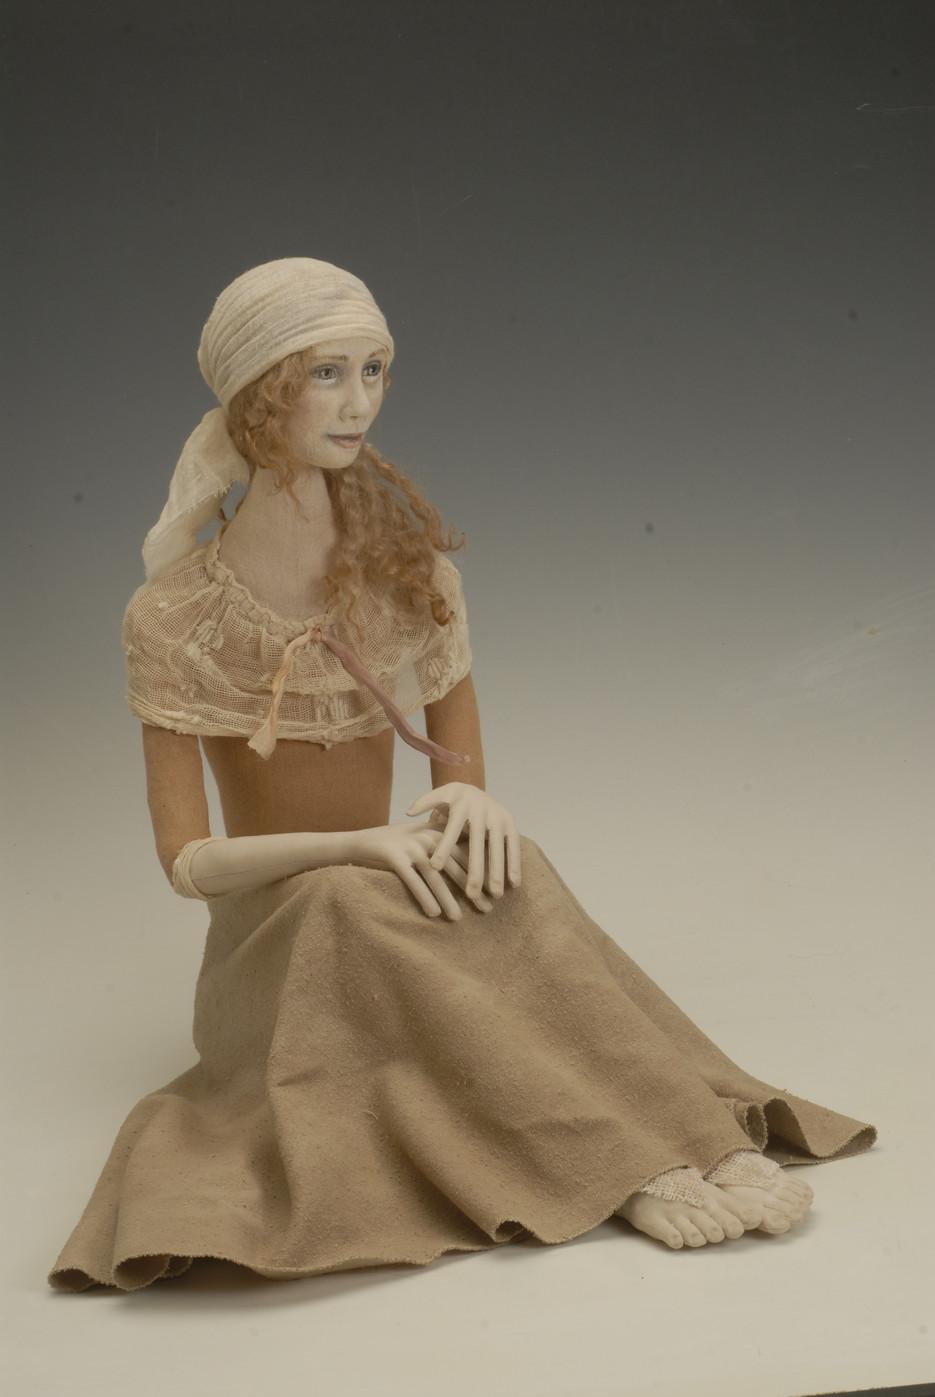 Sybil 1 - Sold